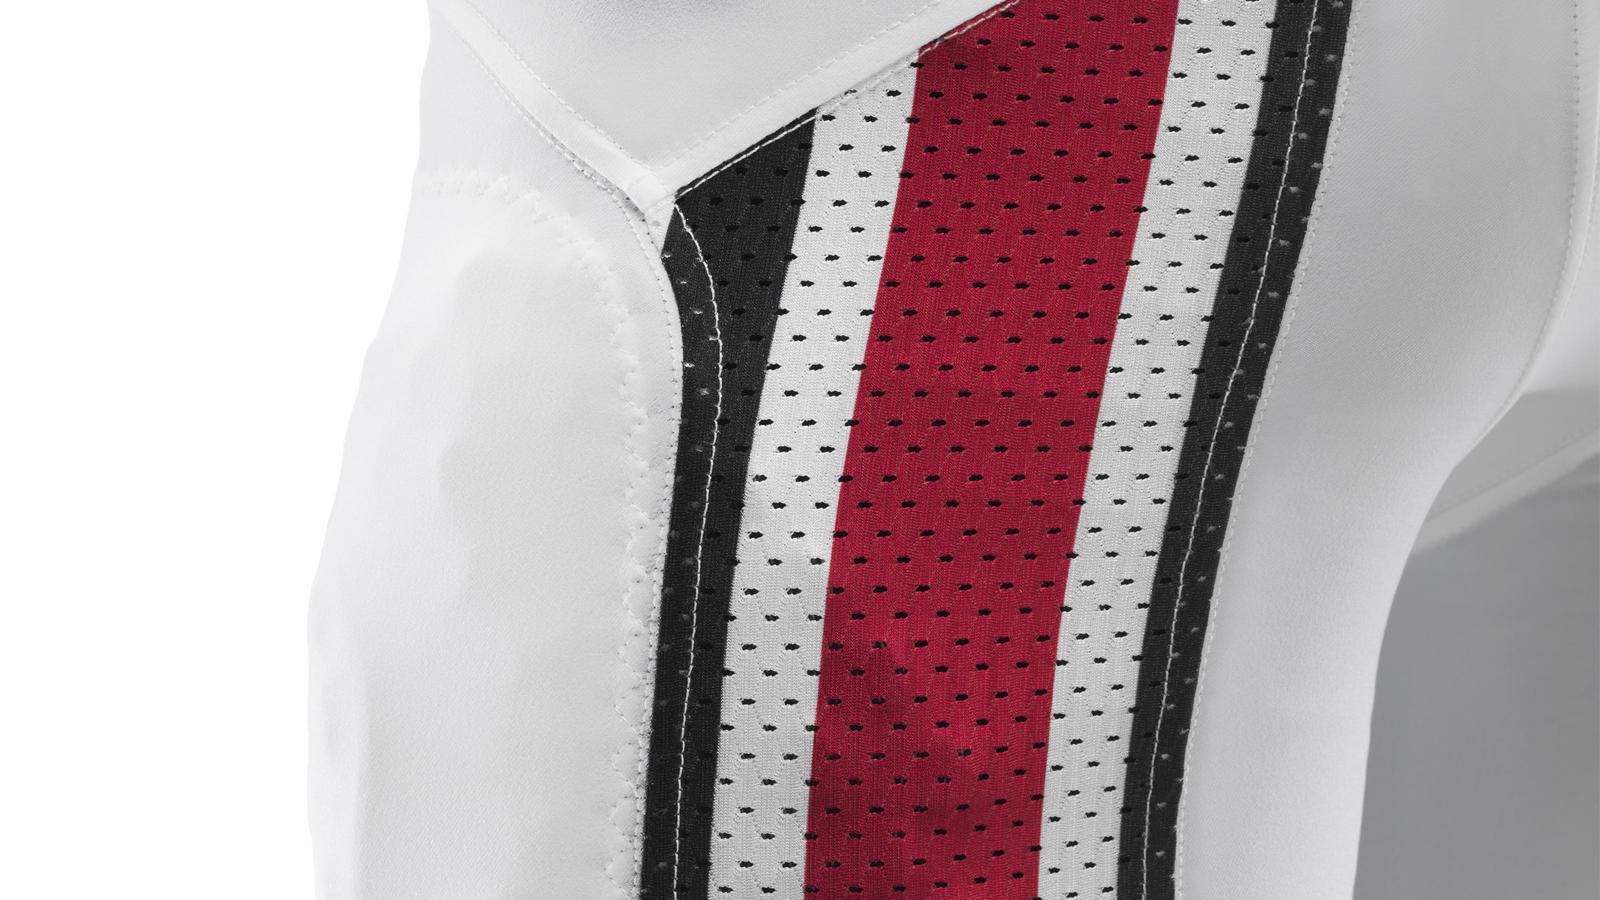 ncaa_fb13_uniforms_ohio_swoosh_pant_0056